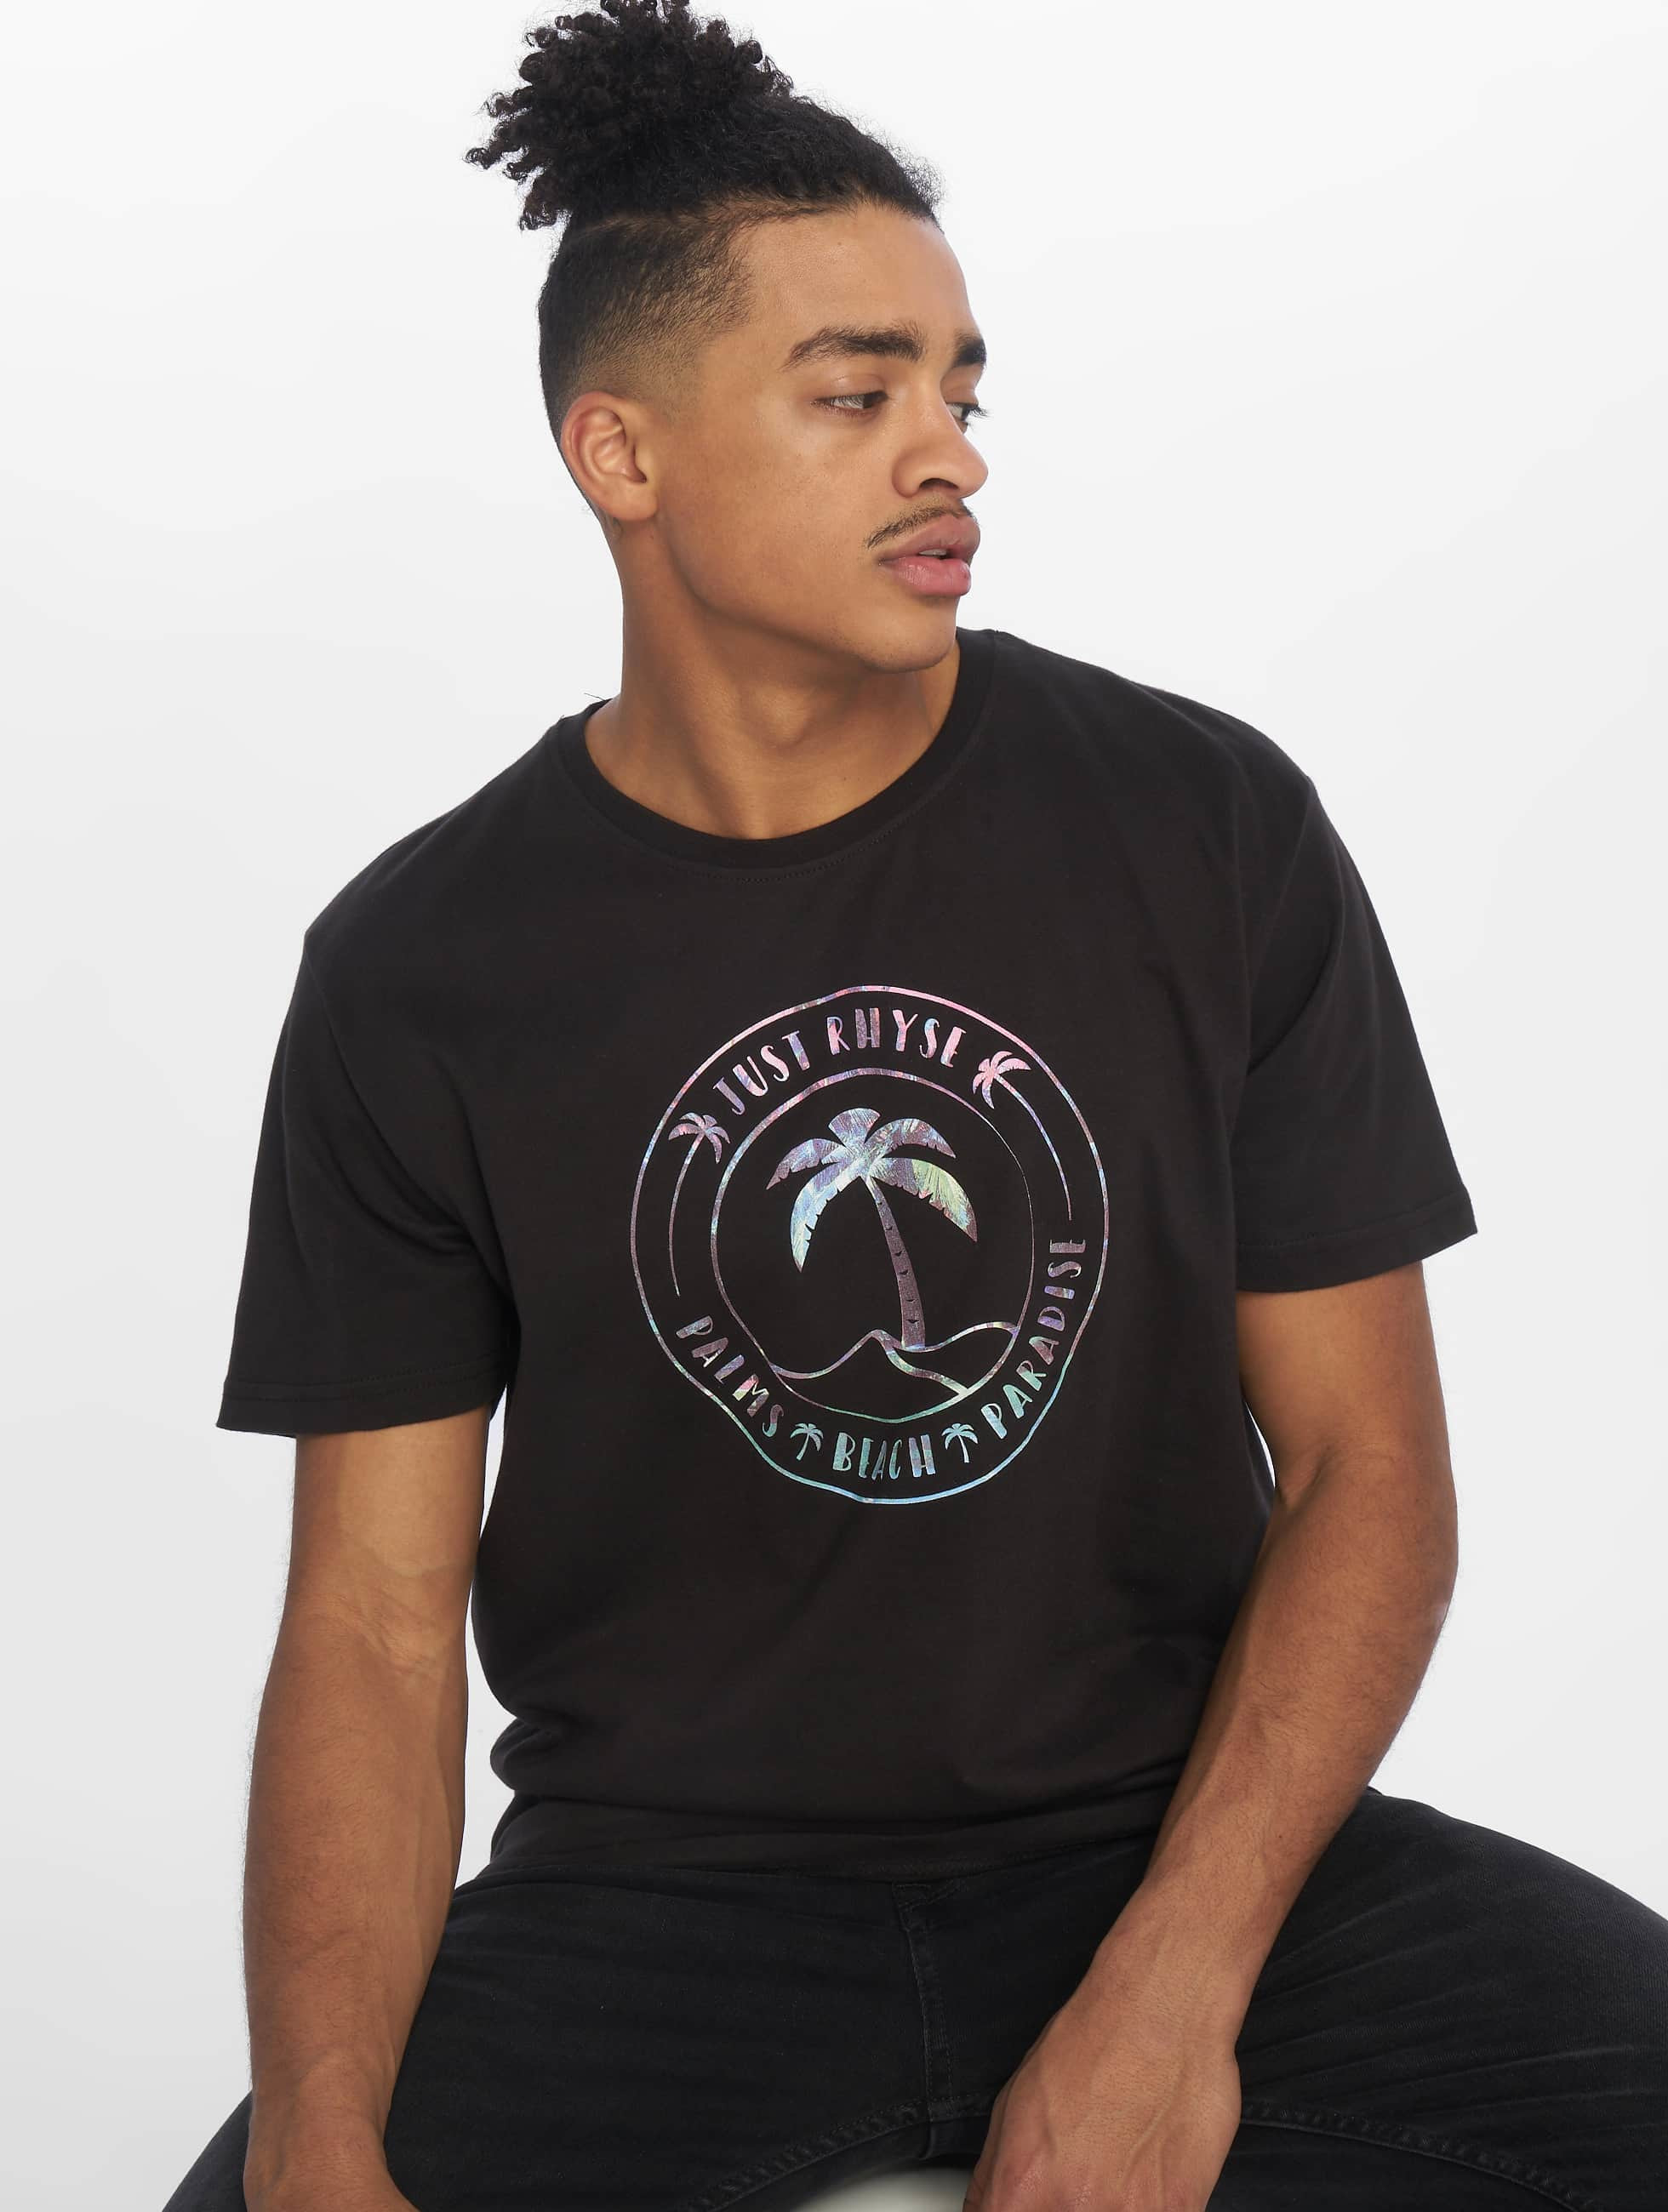 Just Rhyse / T-Shirt Siesta Key in black S